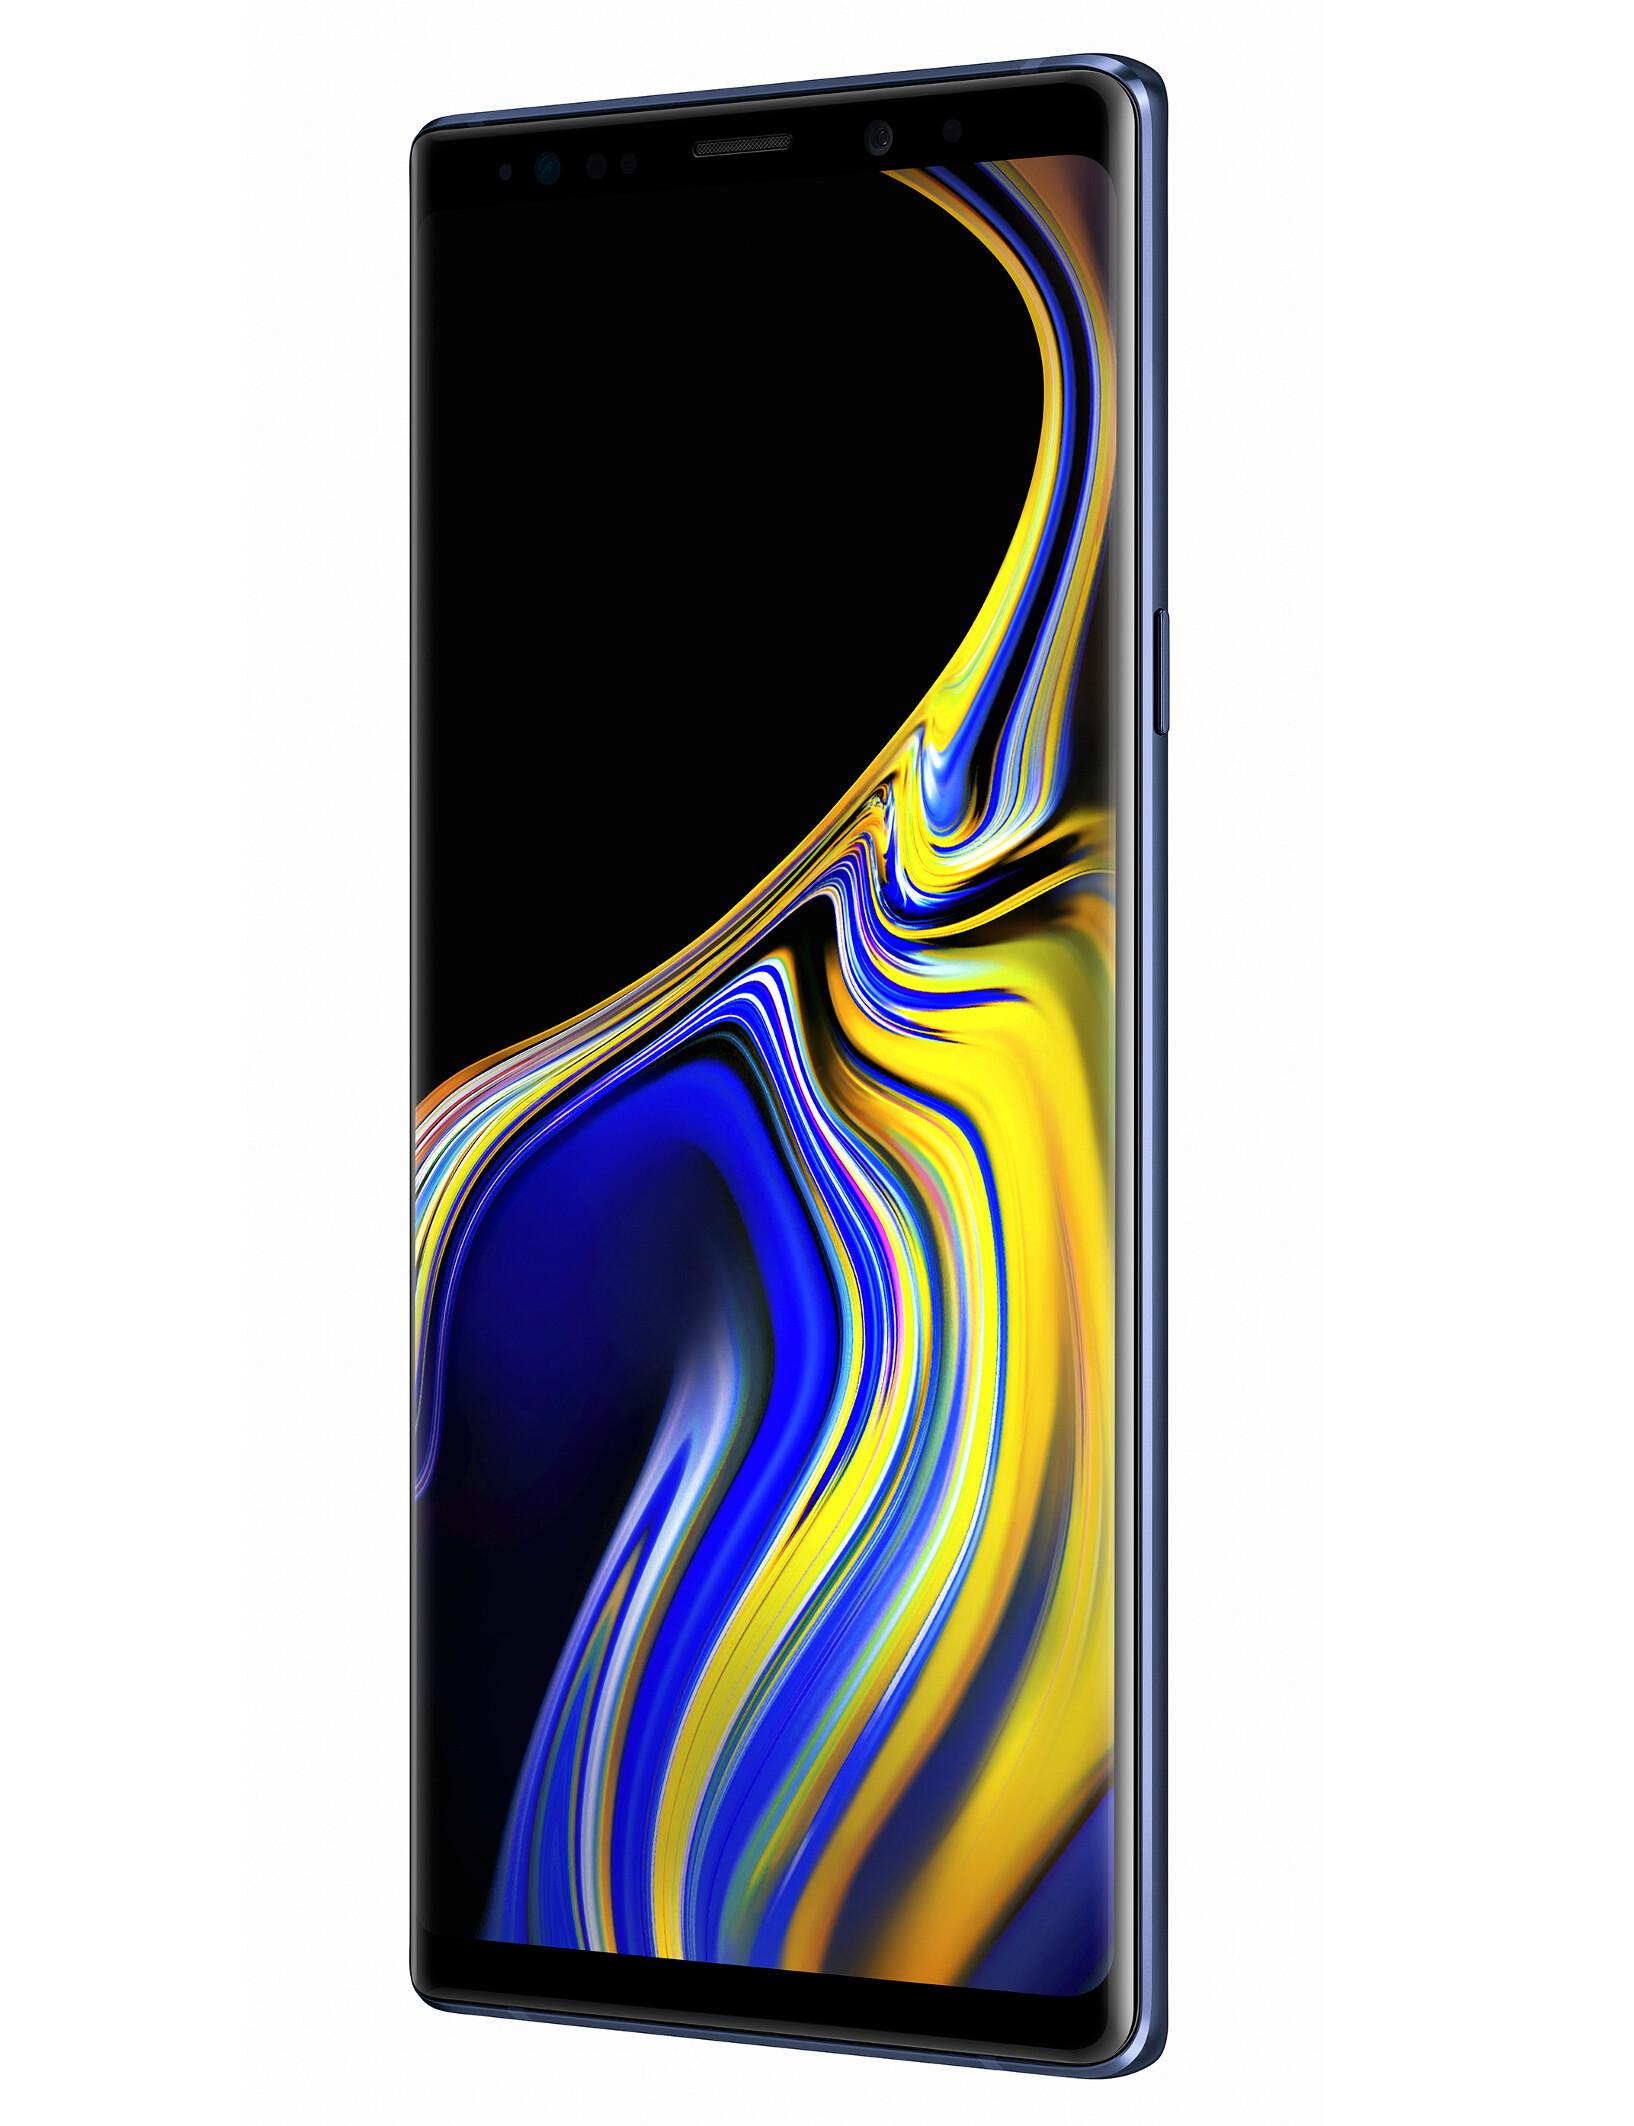 Samsung Galaxy Note 9 Specs